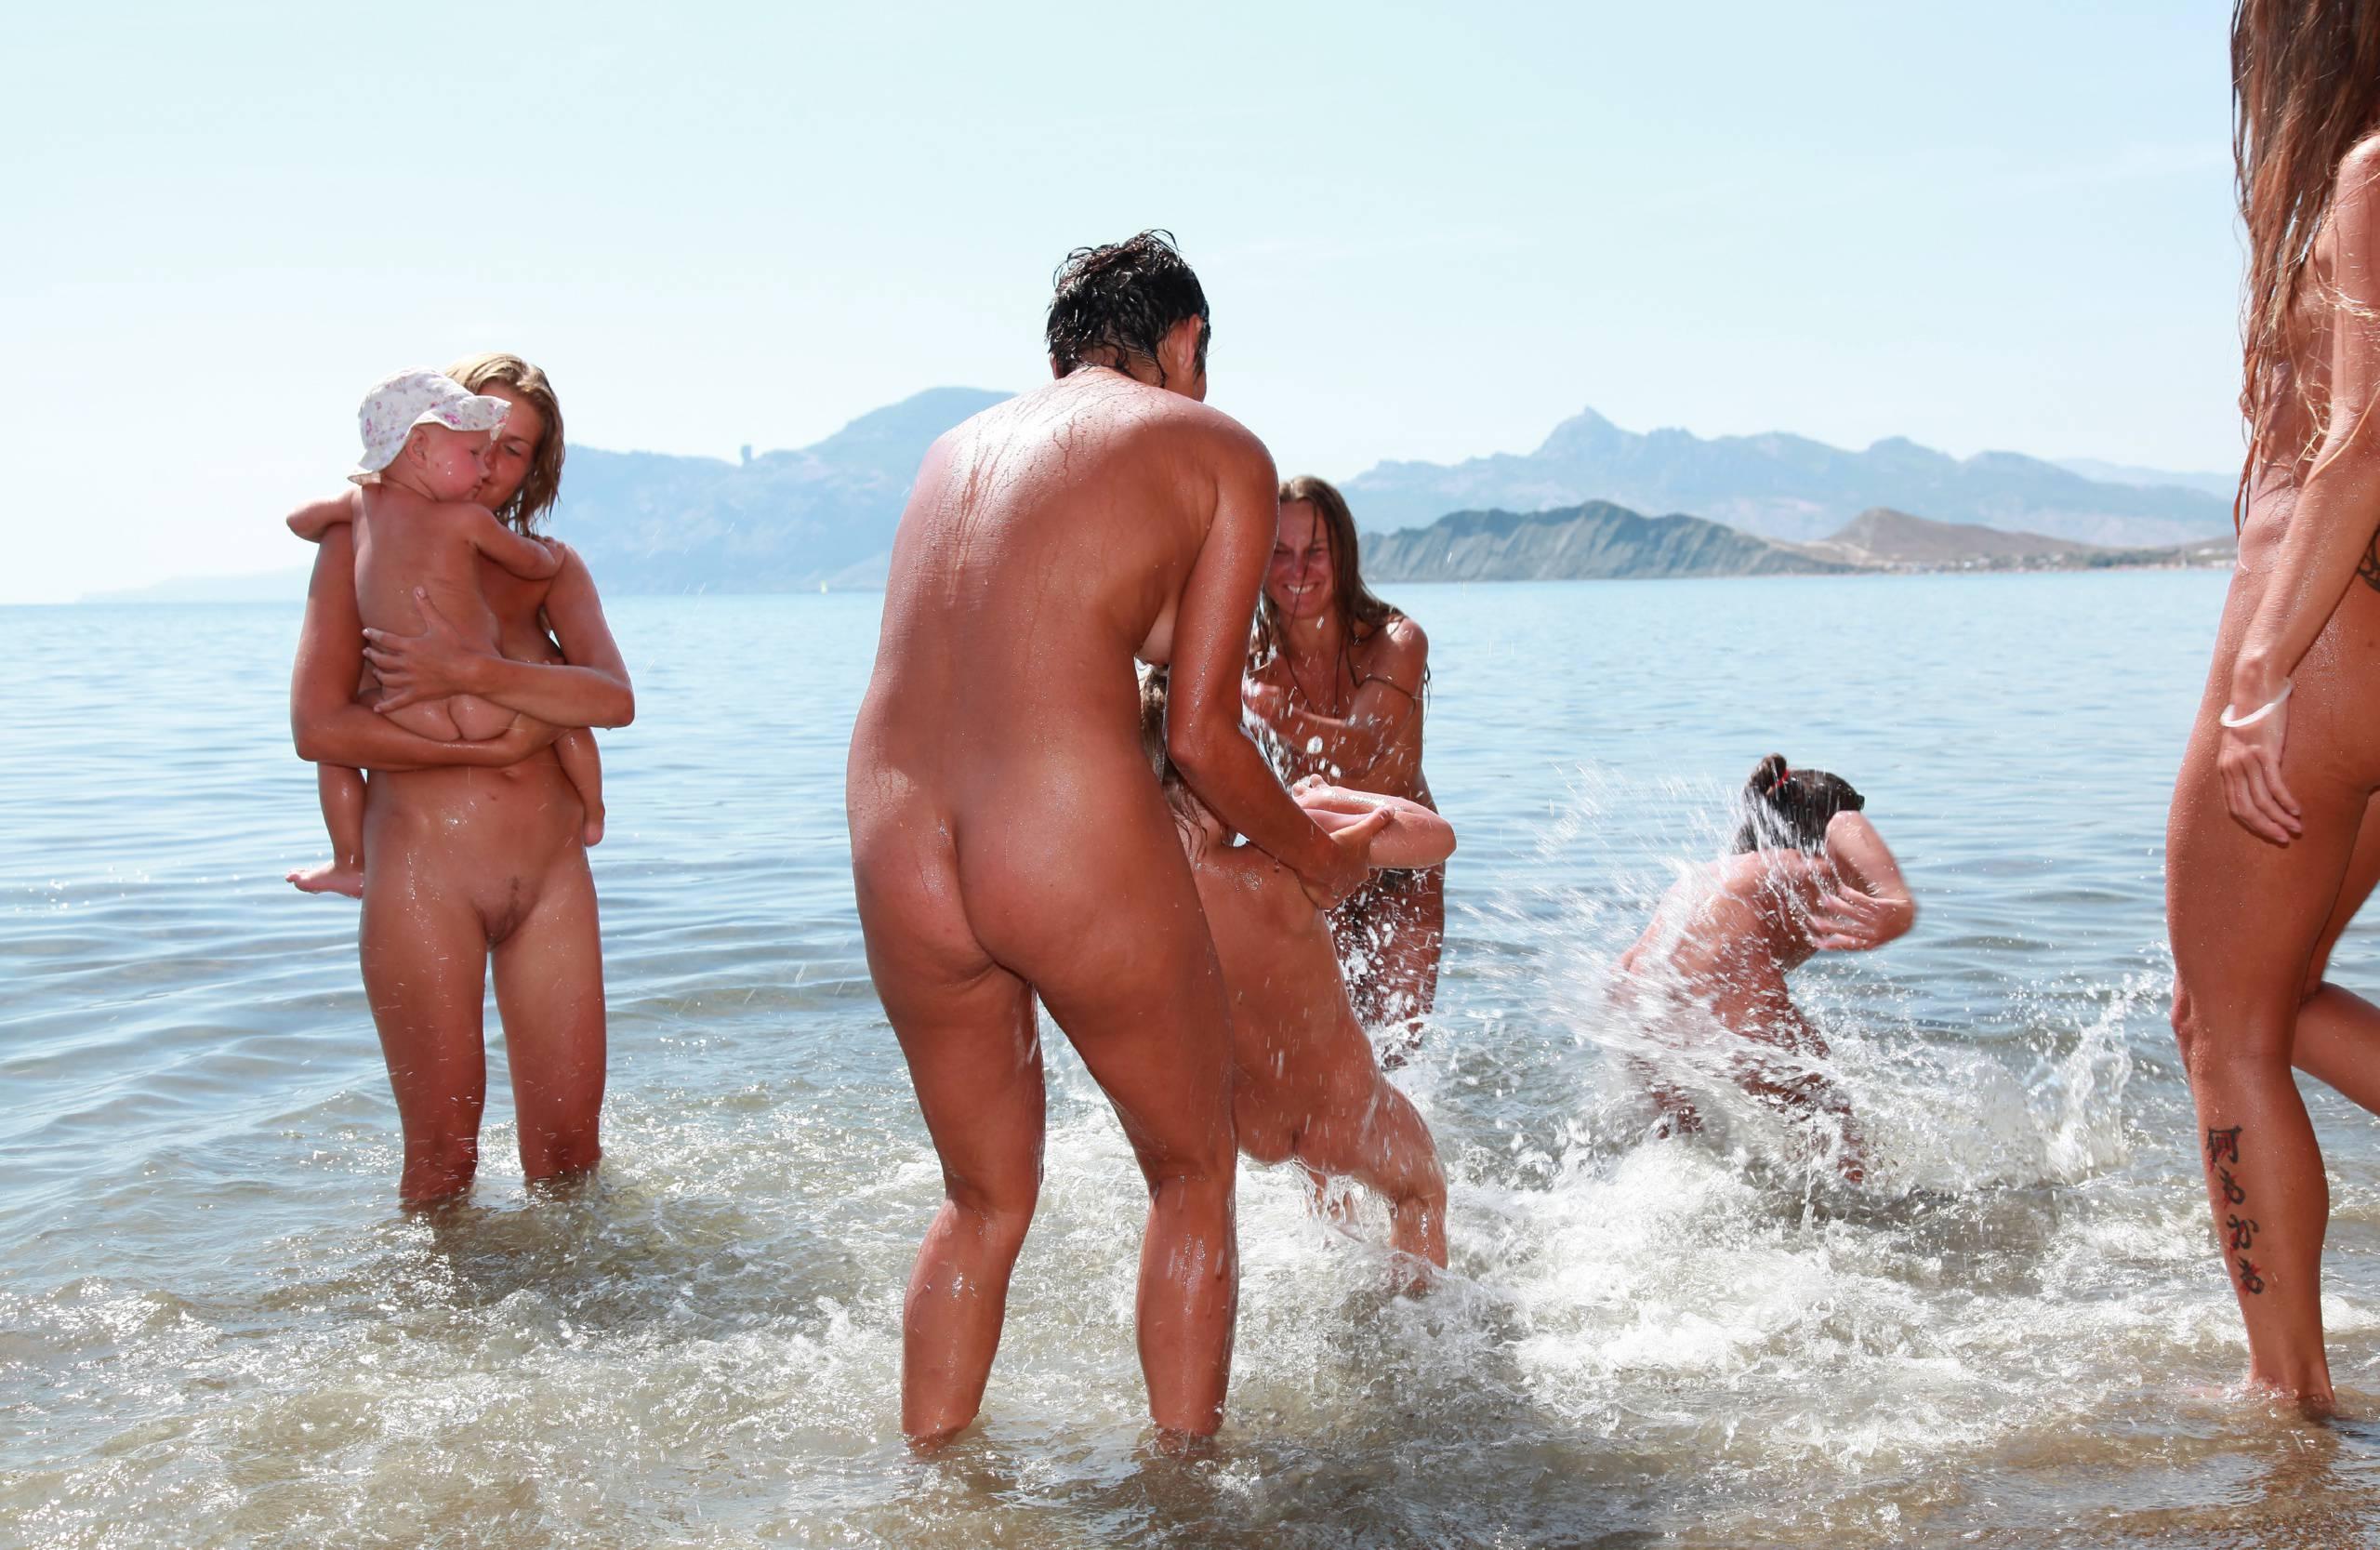 Nudist Pics Day of Rocky Sports - 2